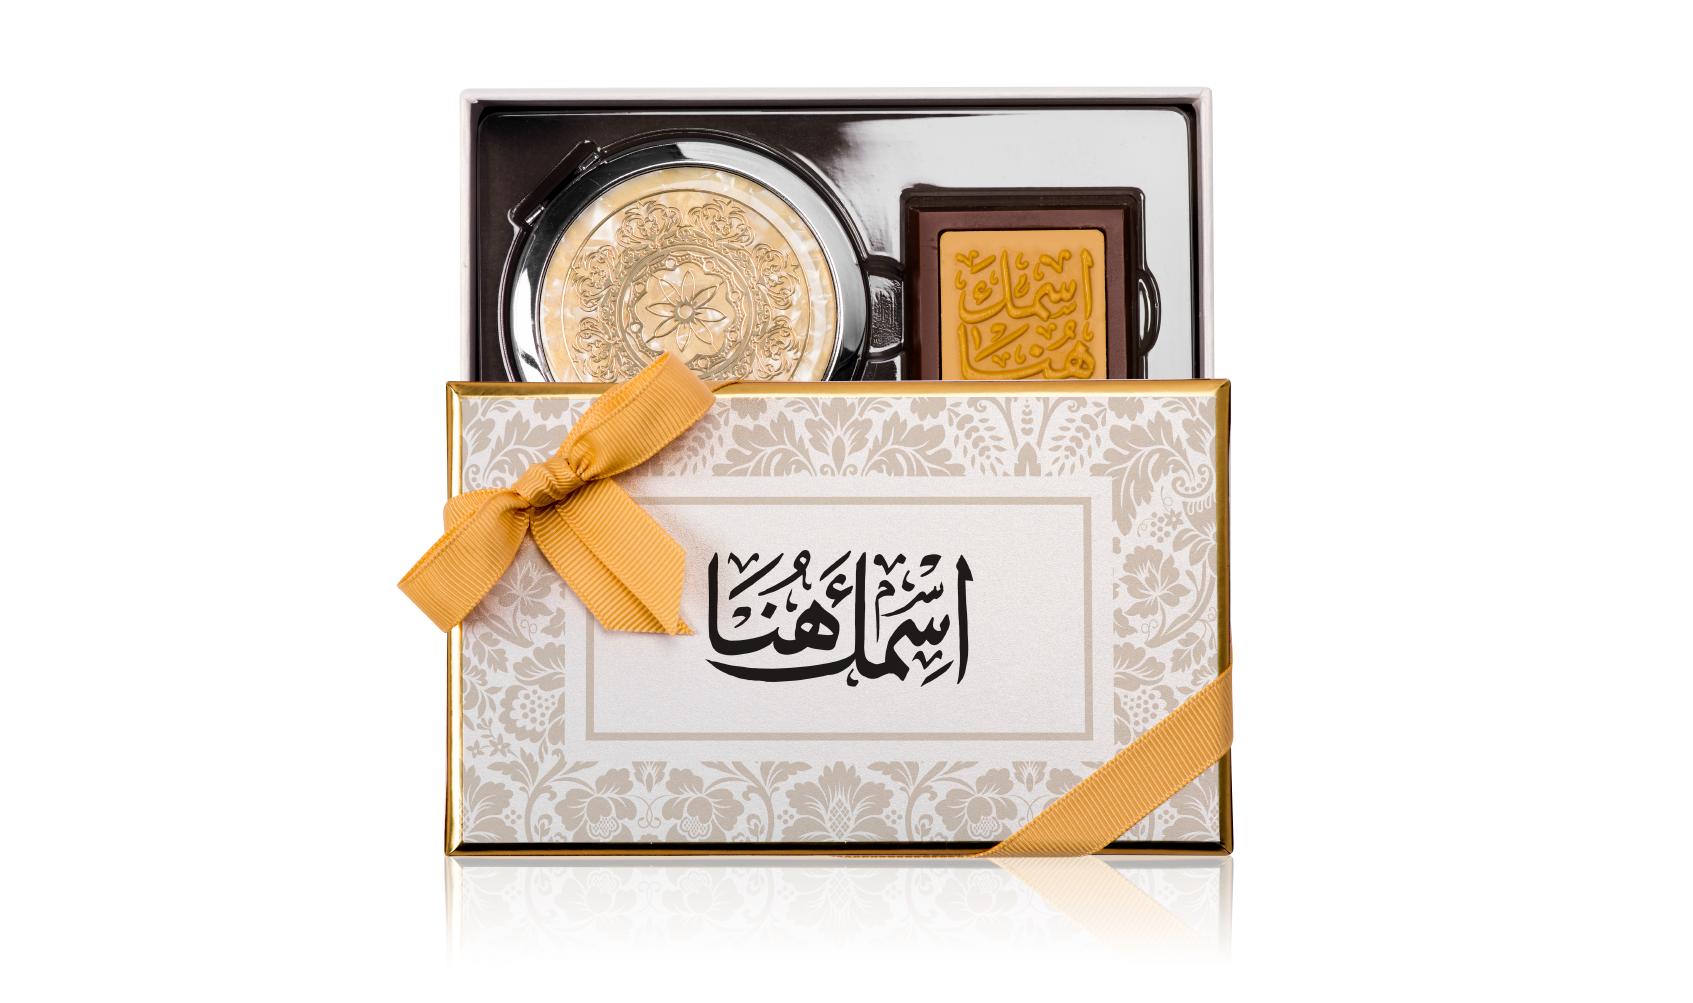 Gold Miror Boxes